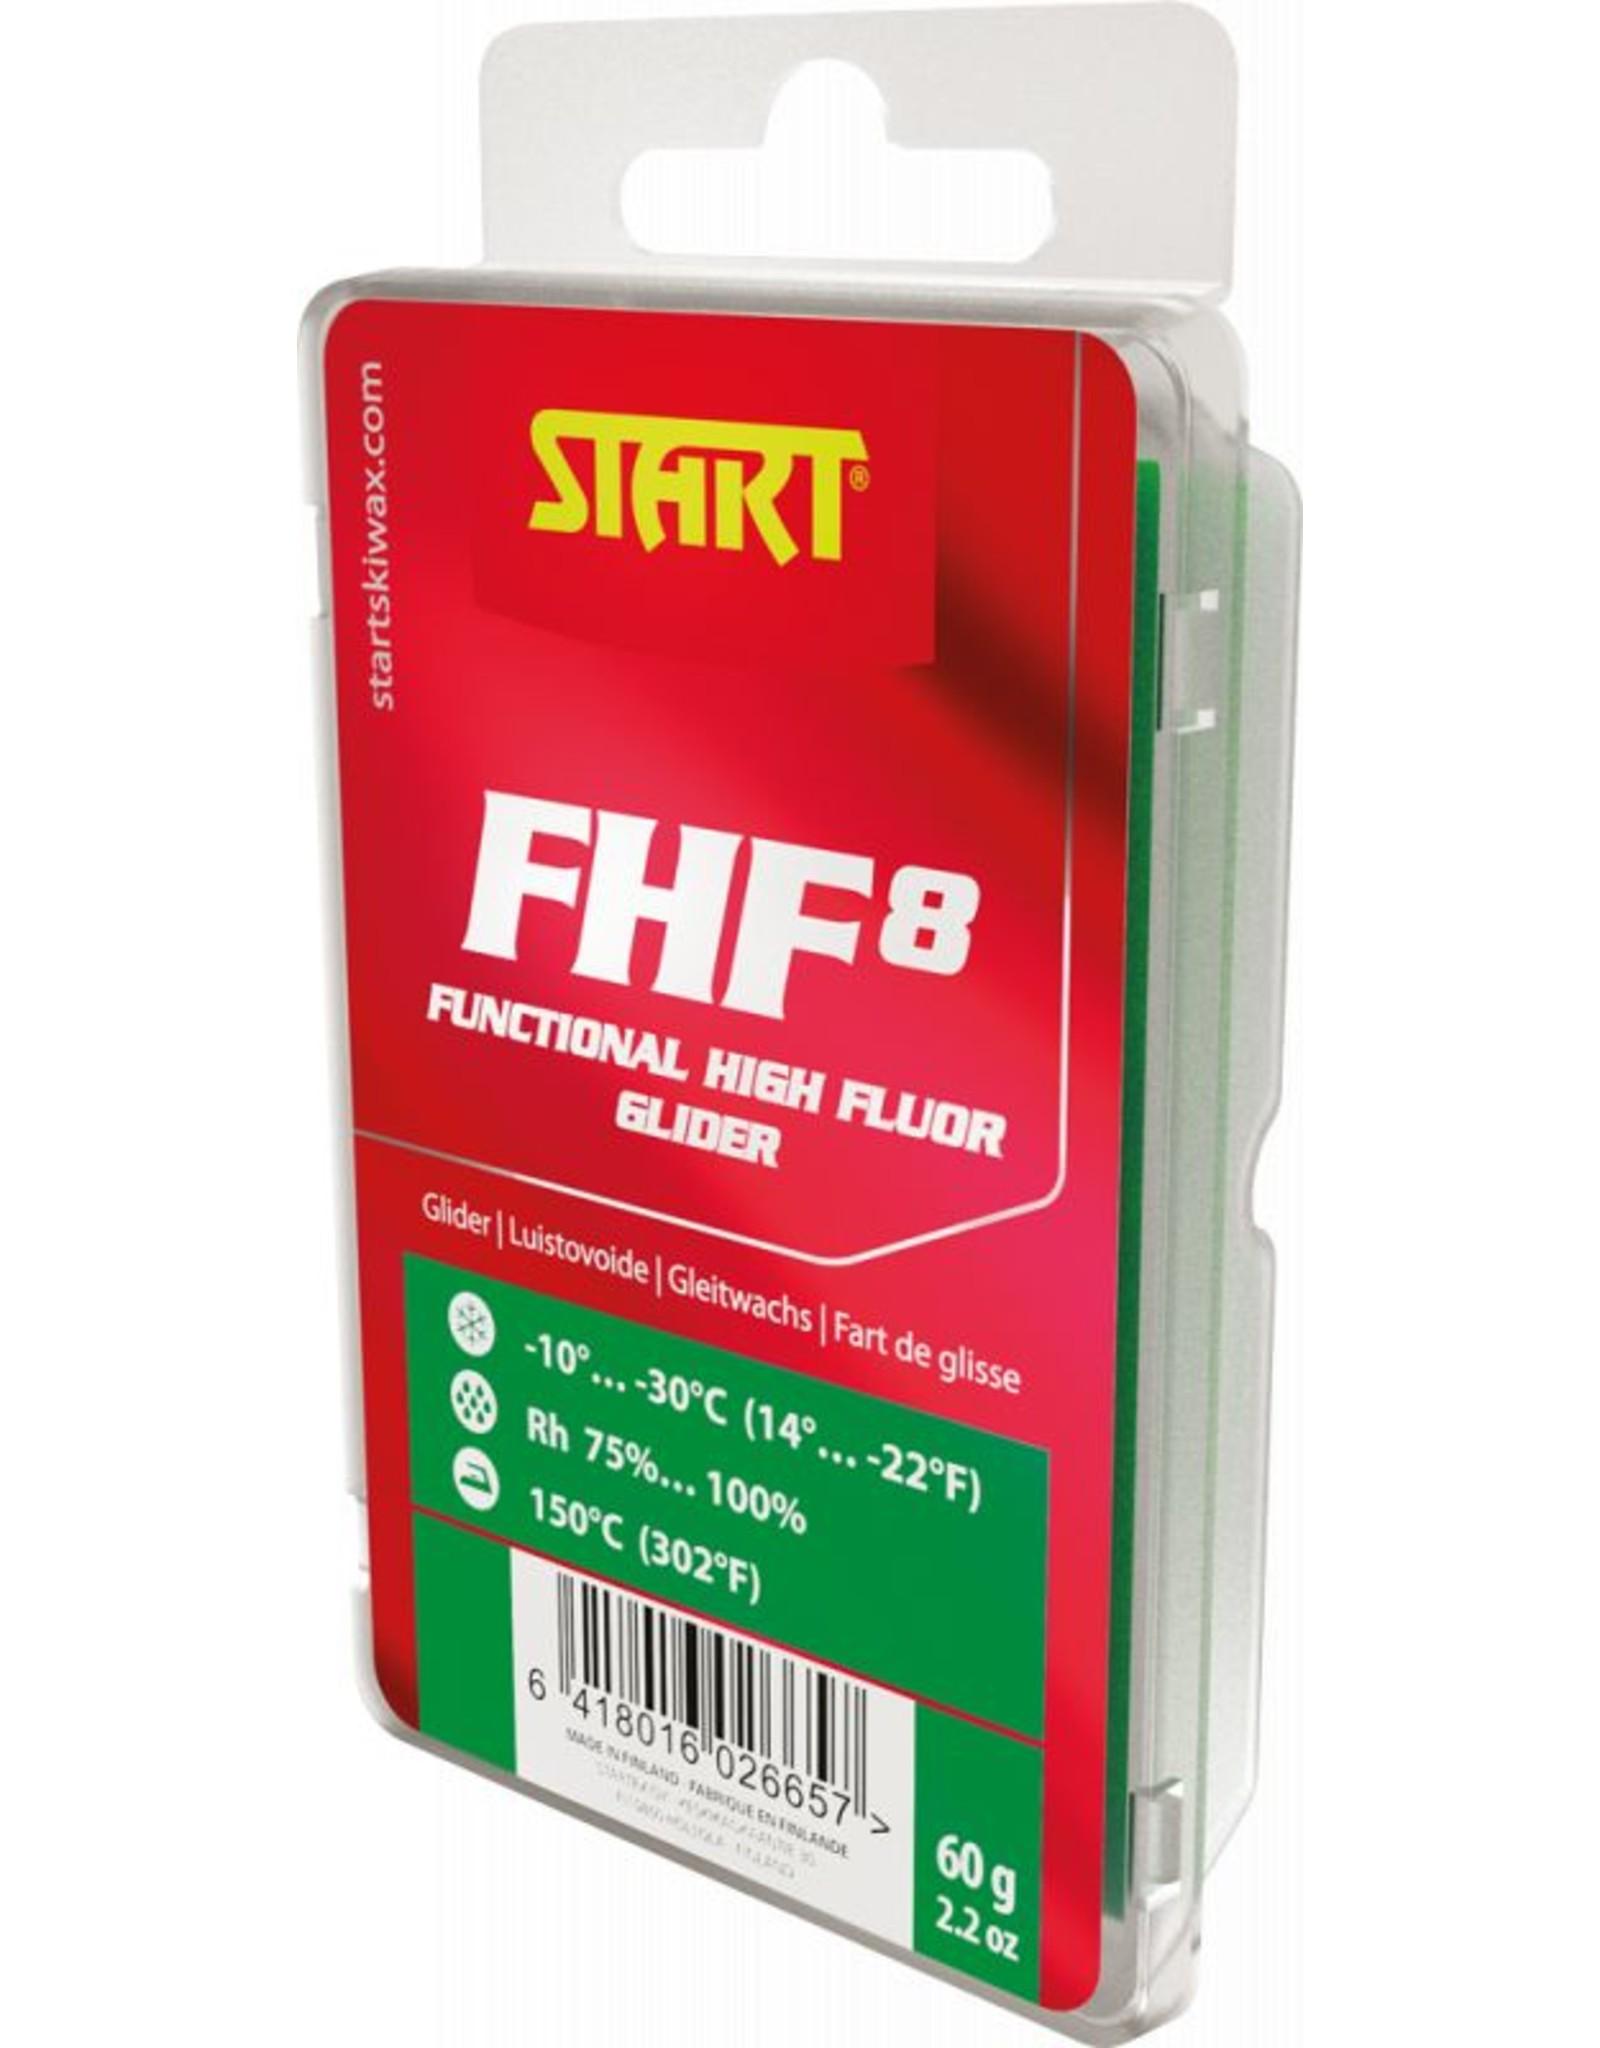 Start FHF8 Glider Green 40g